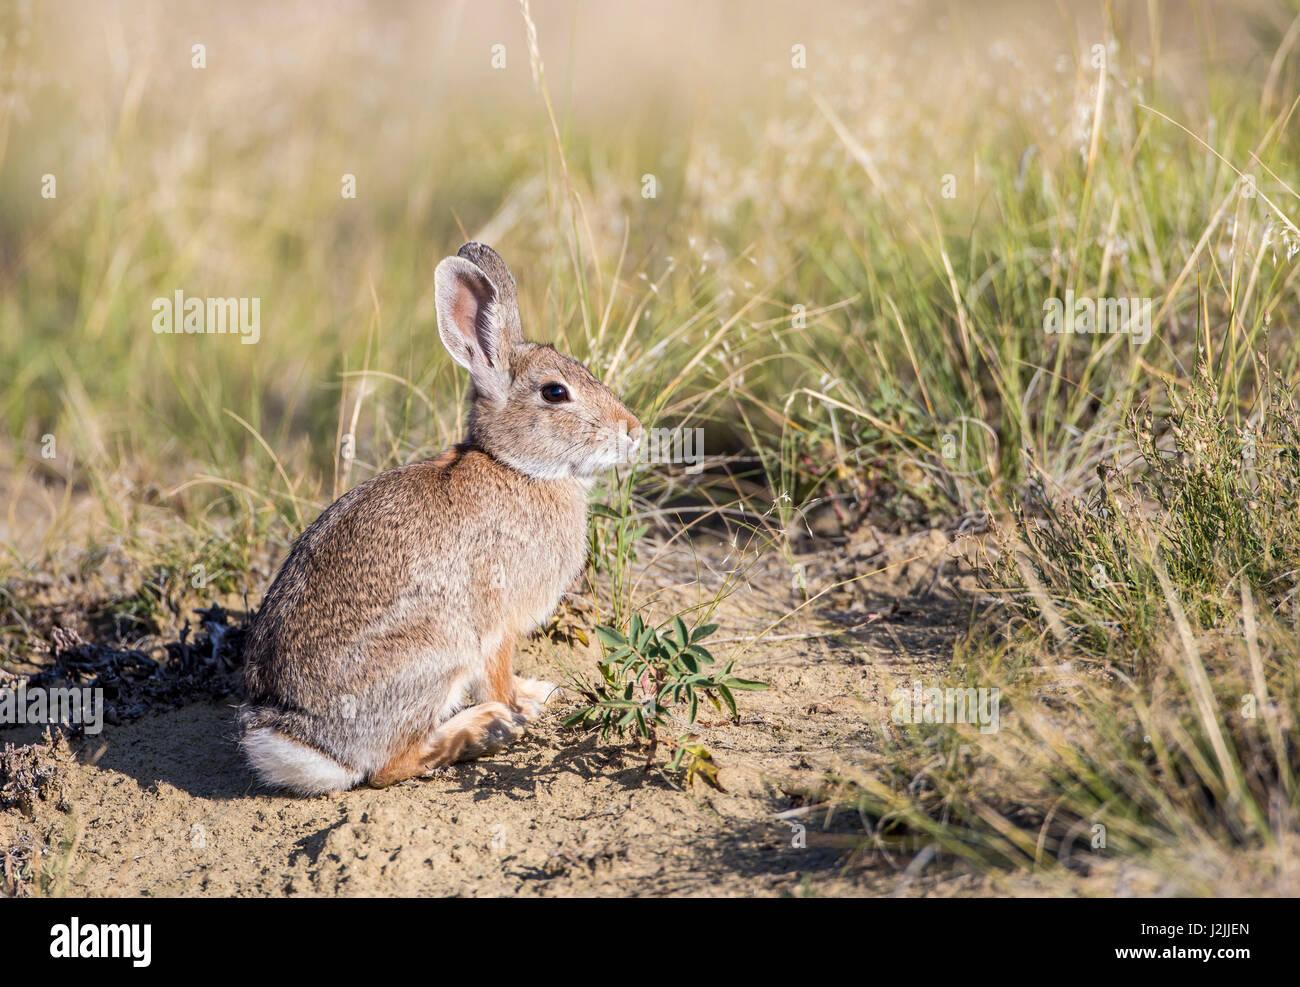 USA, Wyoming, Sublette County, Cottontail Rabbit - Stock-Bilder